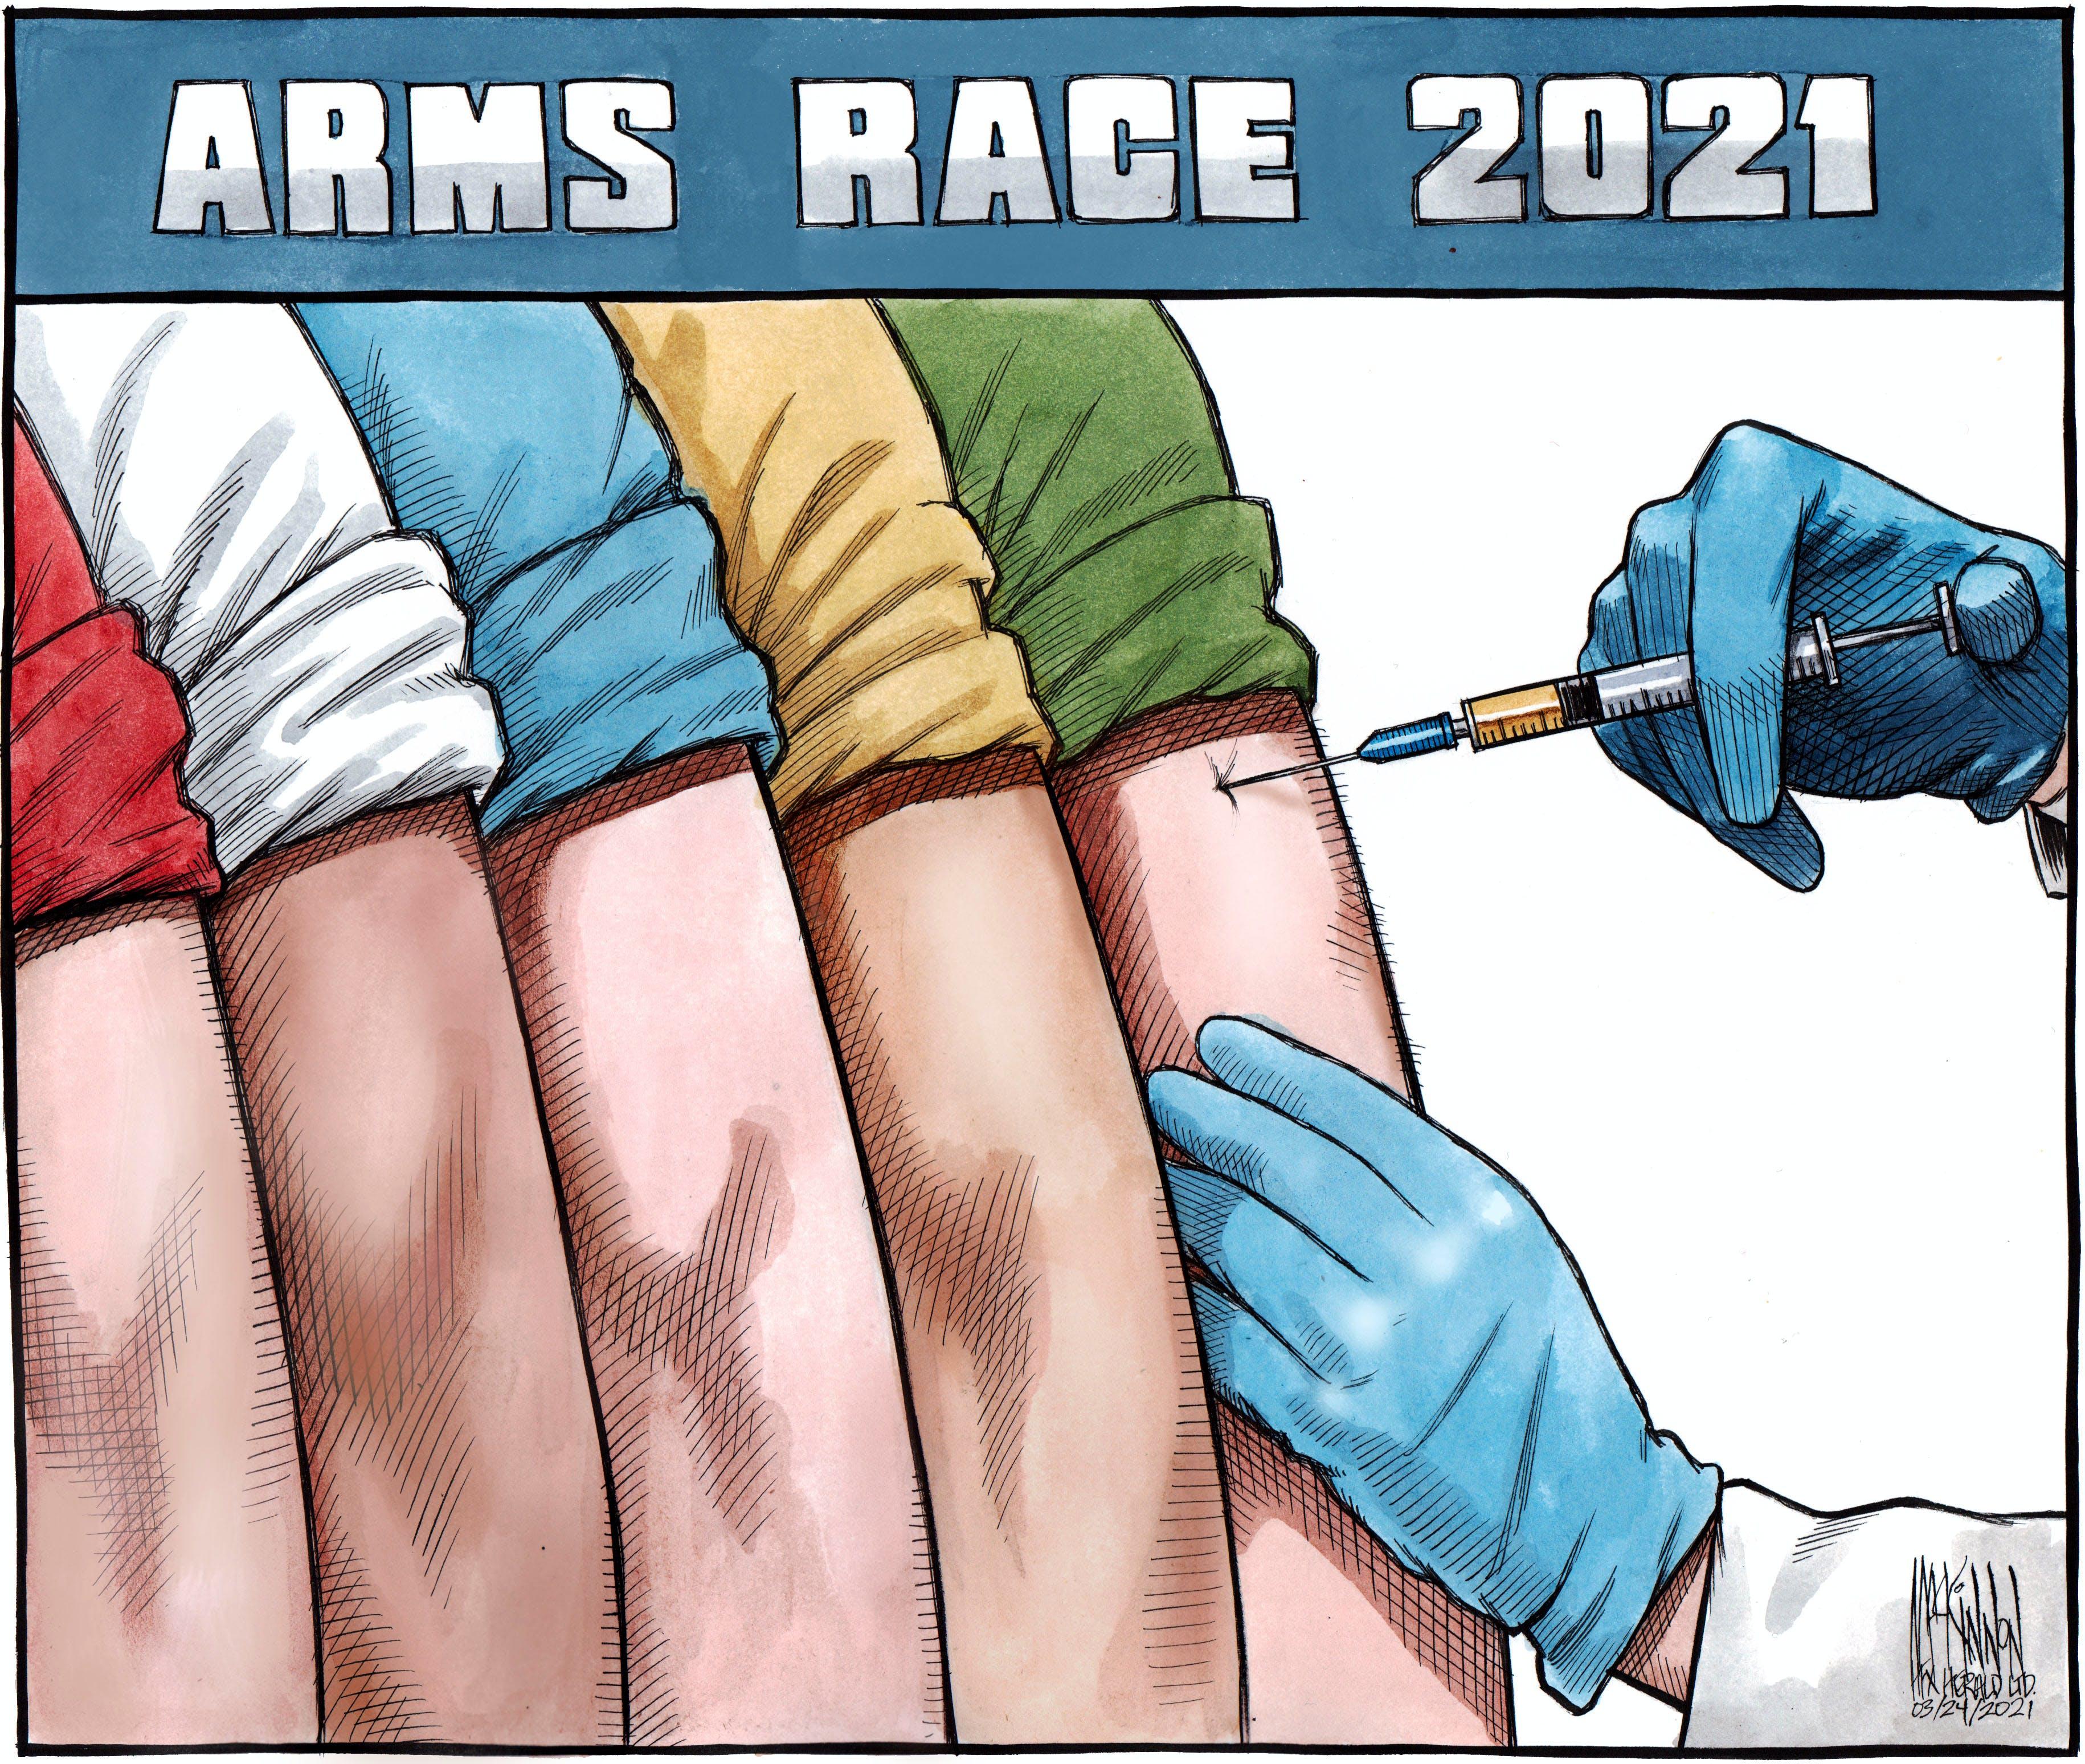 Bruce MacKinnon's editorial cartoon for March 24, 2021.